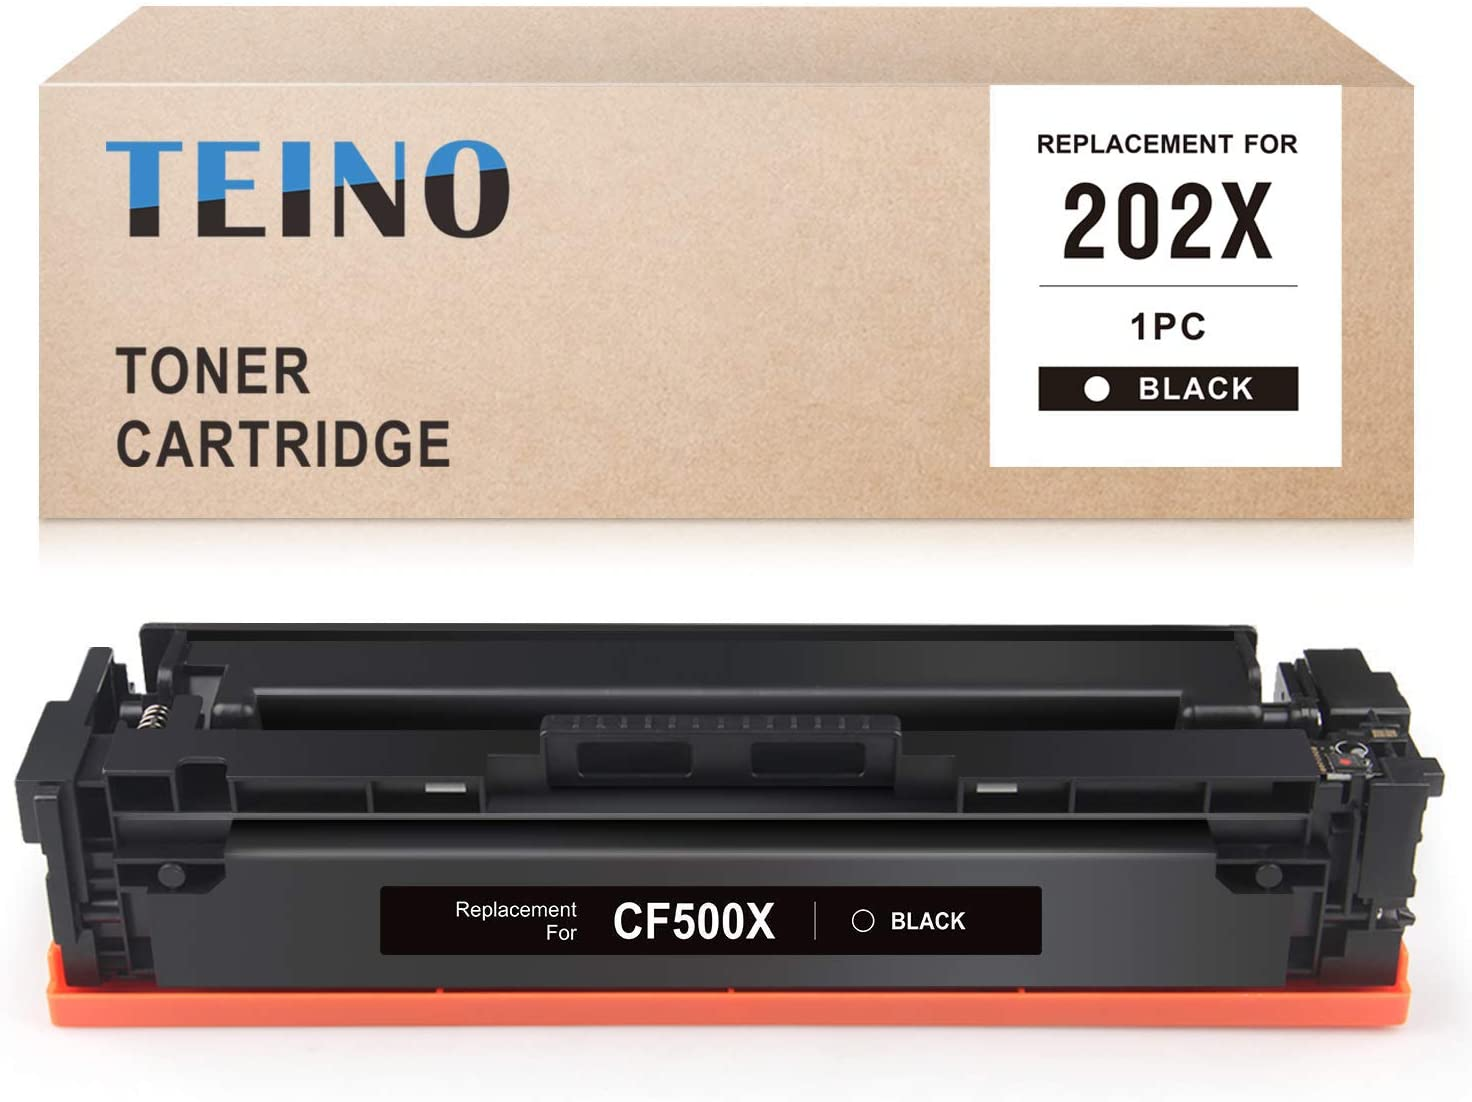 TEINO Compatible Toner Cartridge Replacement for HP 202X CF500X 202A CF500A for Color Laserjet Pro MFP M281fdw M281cdw M280nw Color Laserjet Pro M254dw (Black, 1 Pack)